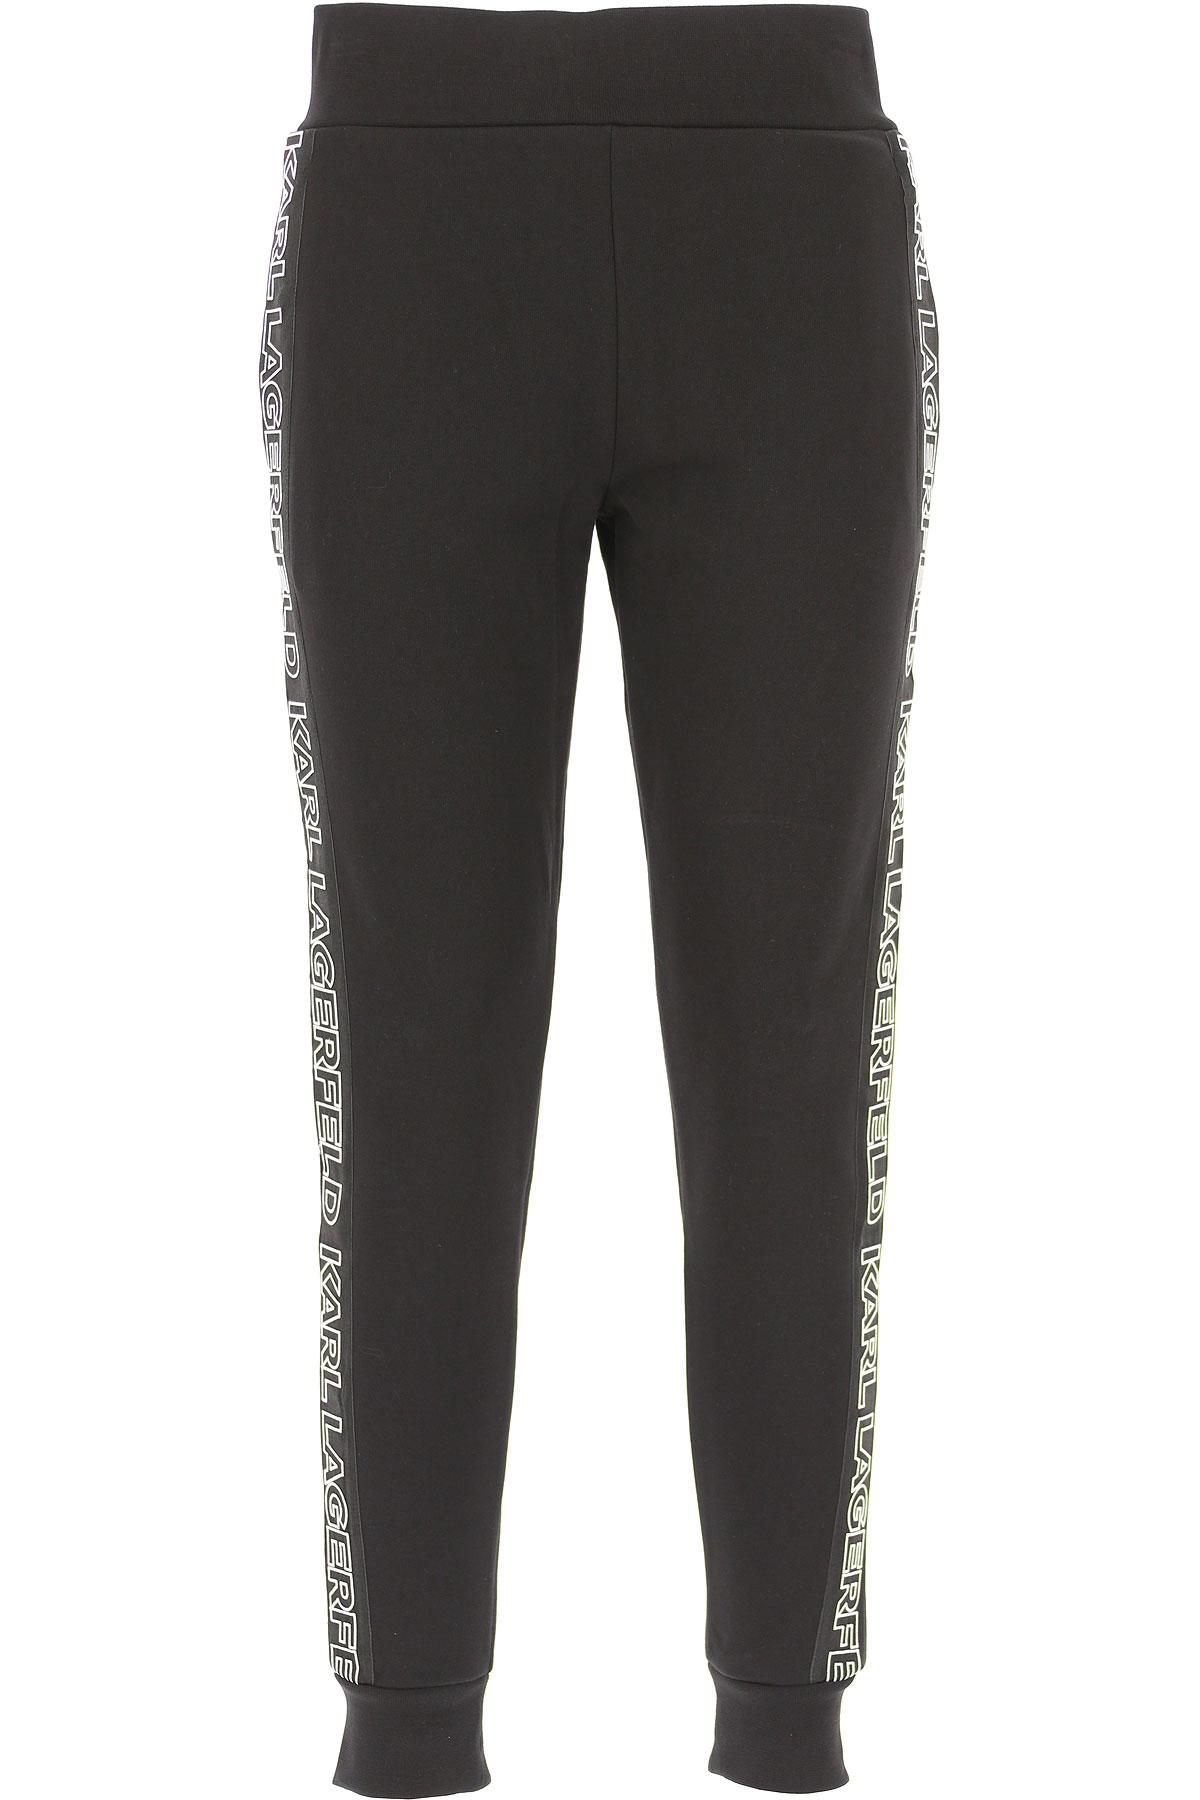 Image of Karl Lagerfeld Sweatpants, Black, Cotton, 2017, 10 4 6 8